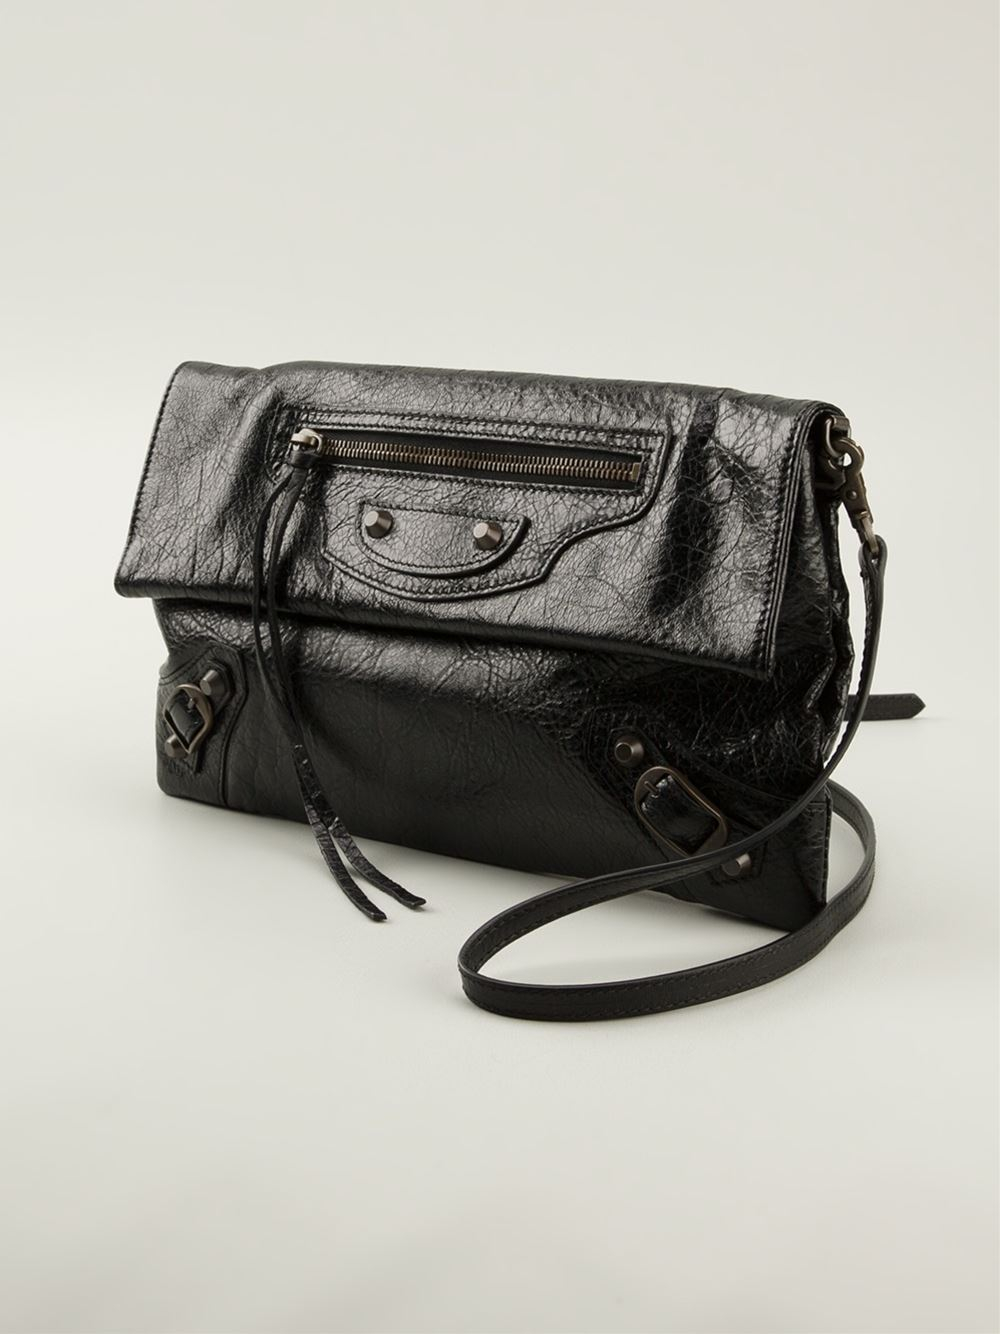 Lyst - Balenciaga Classic Envelope Clutch in Black 29296278b